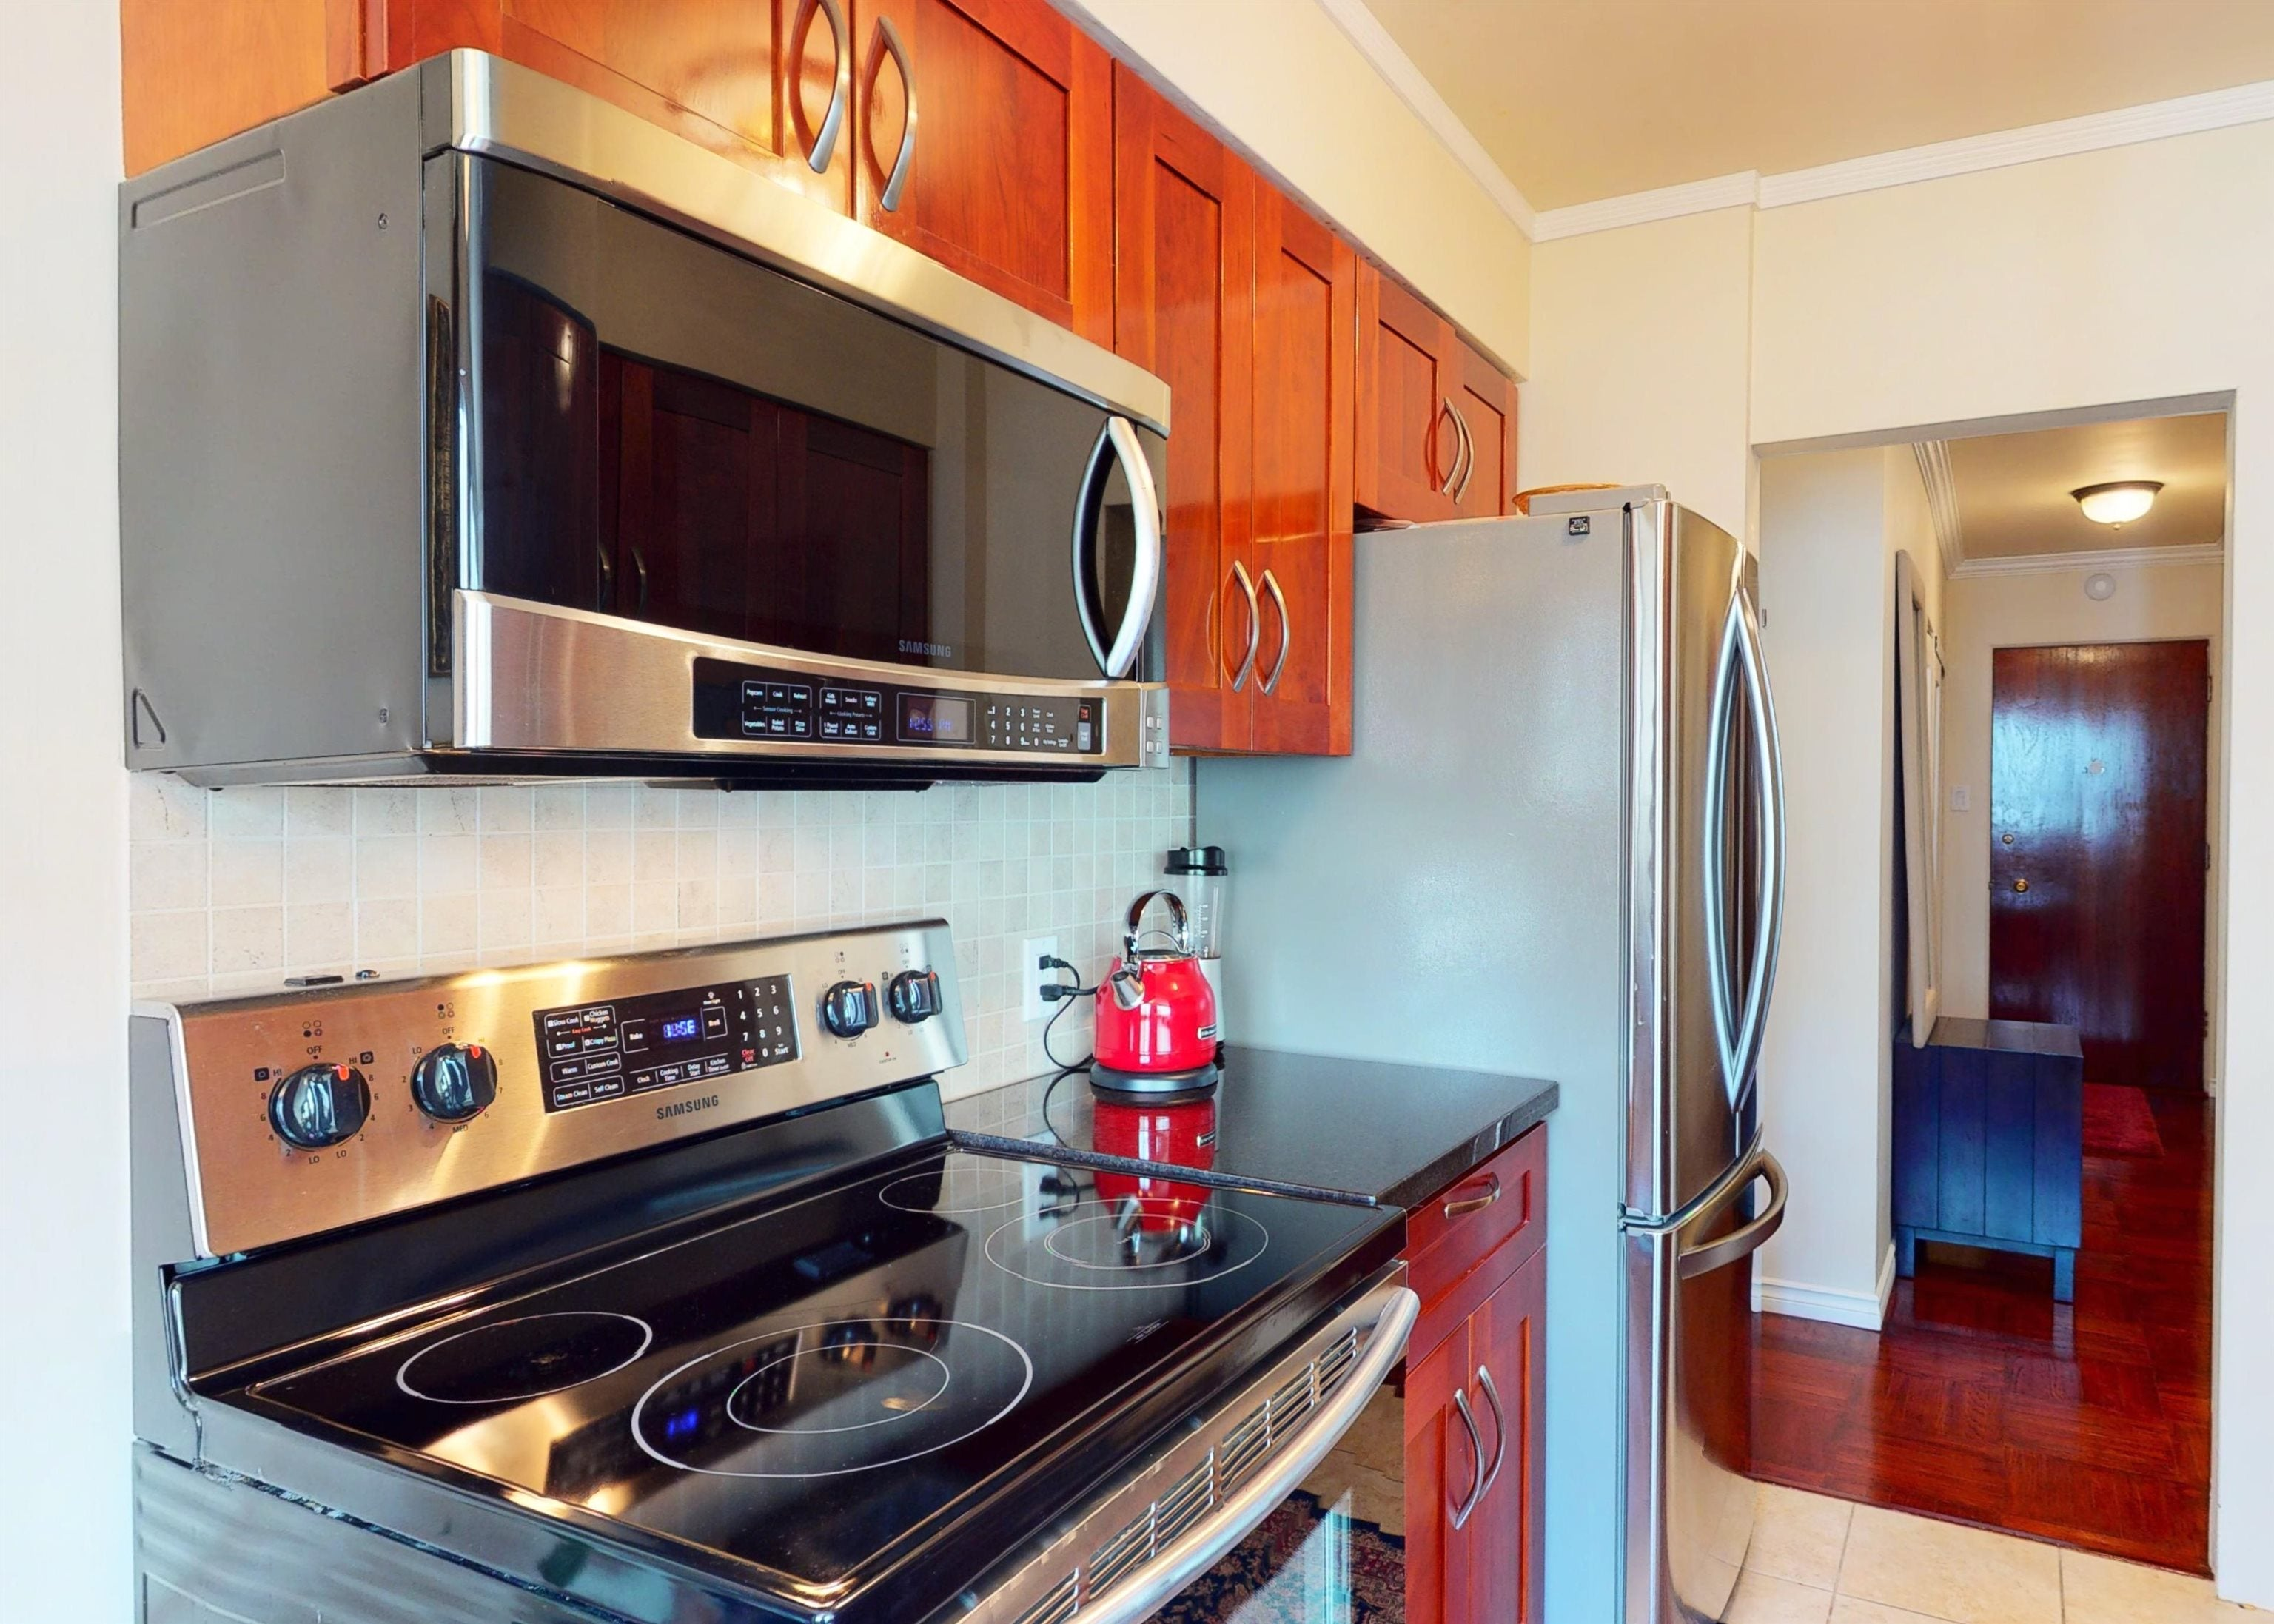 202 1750 ESQUIMALT AVENUE - Ambleside Apartment/Condo for sale, 1 Bedroom (R2610188) - #12